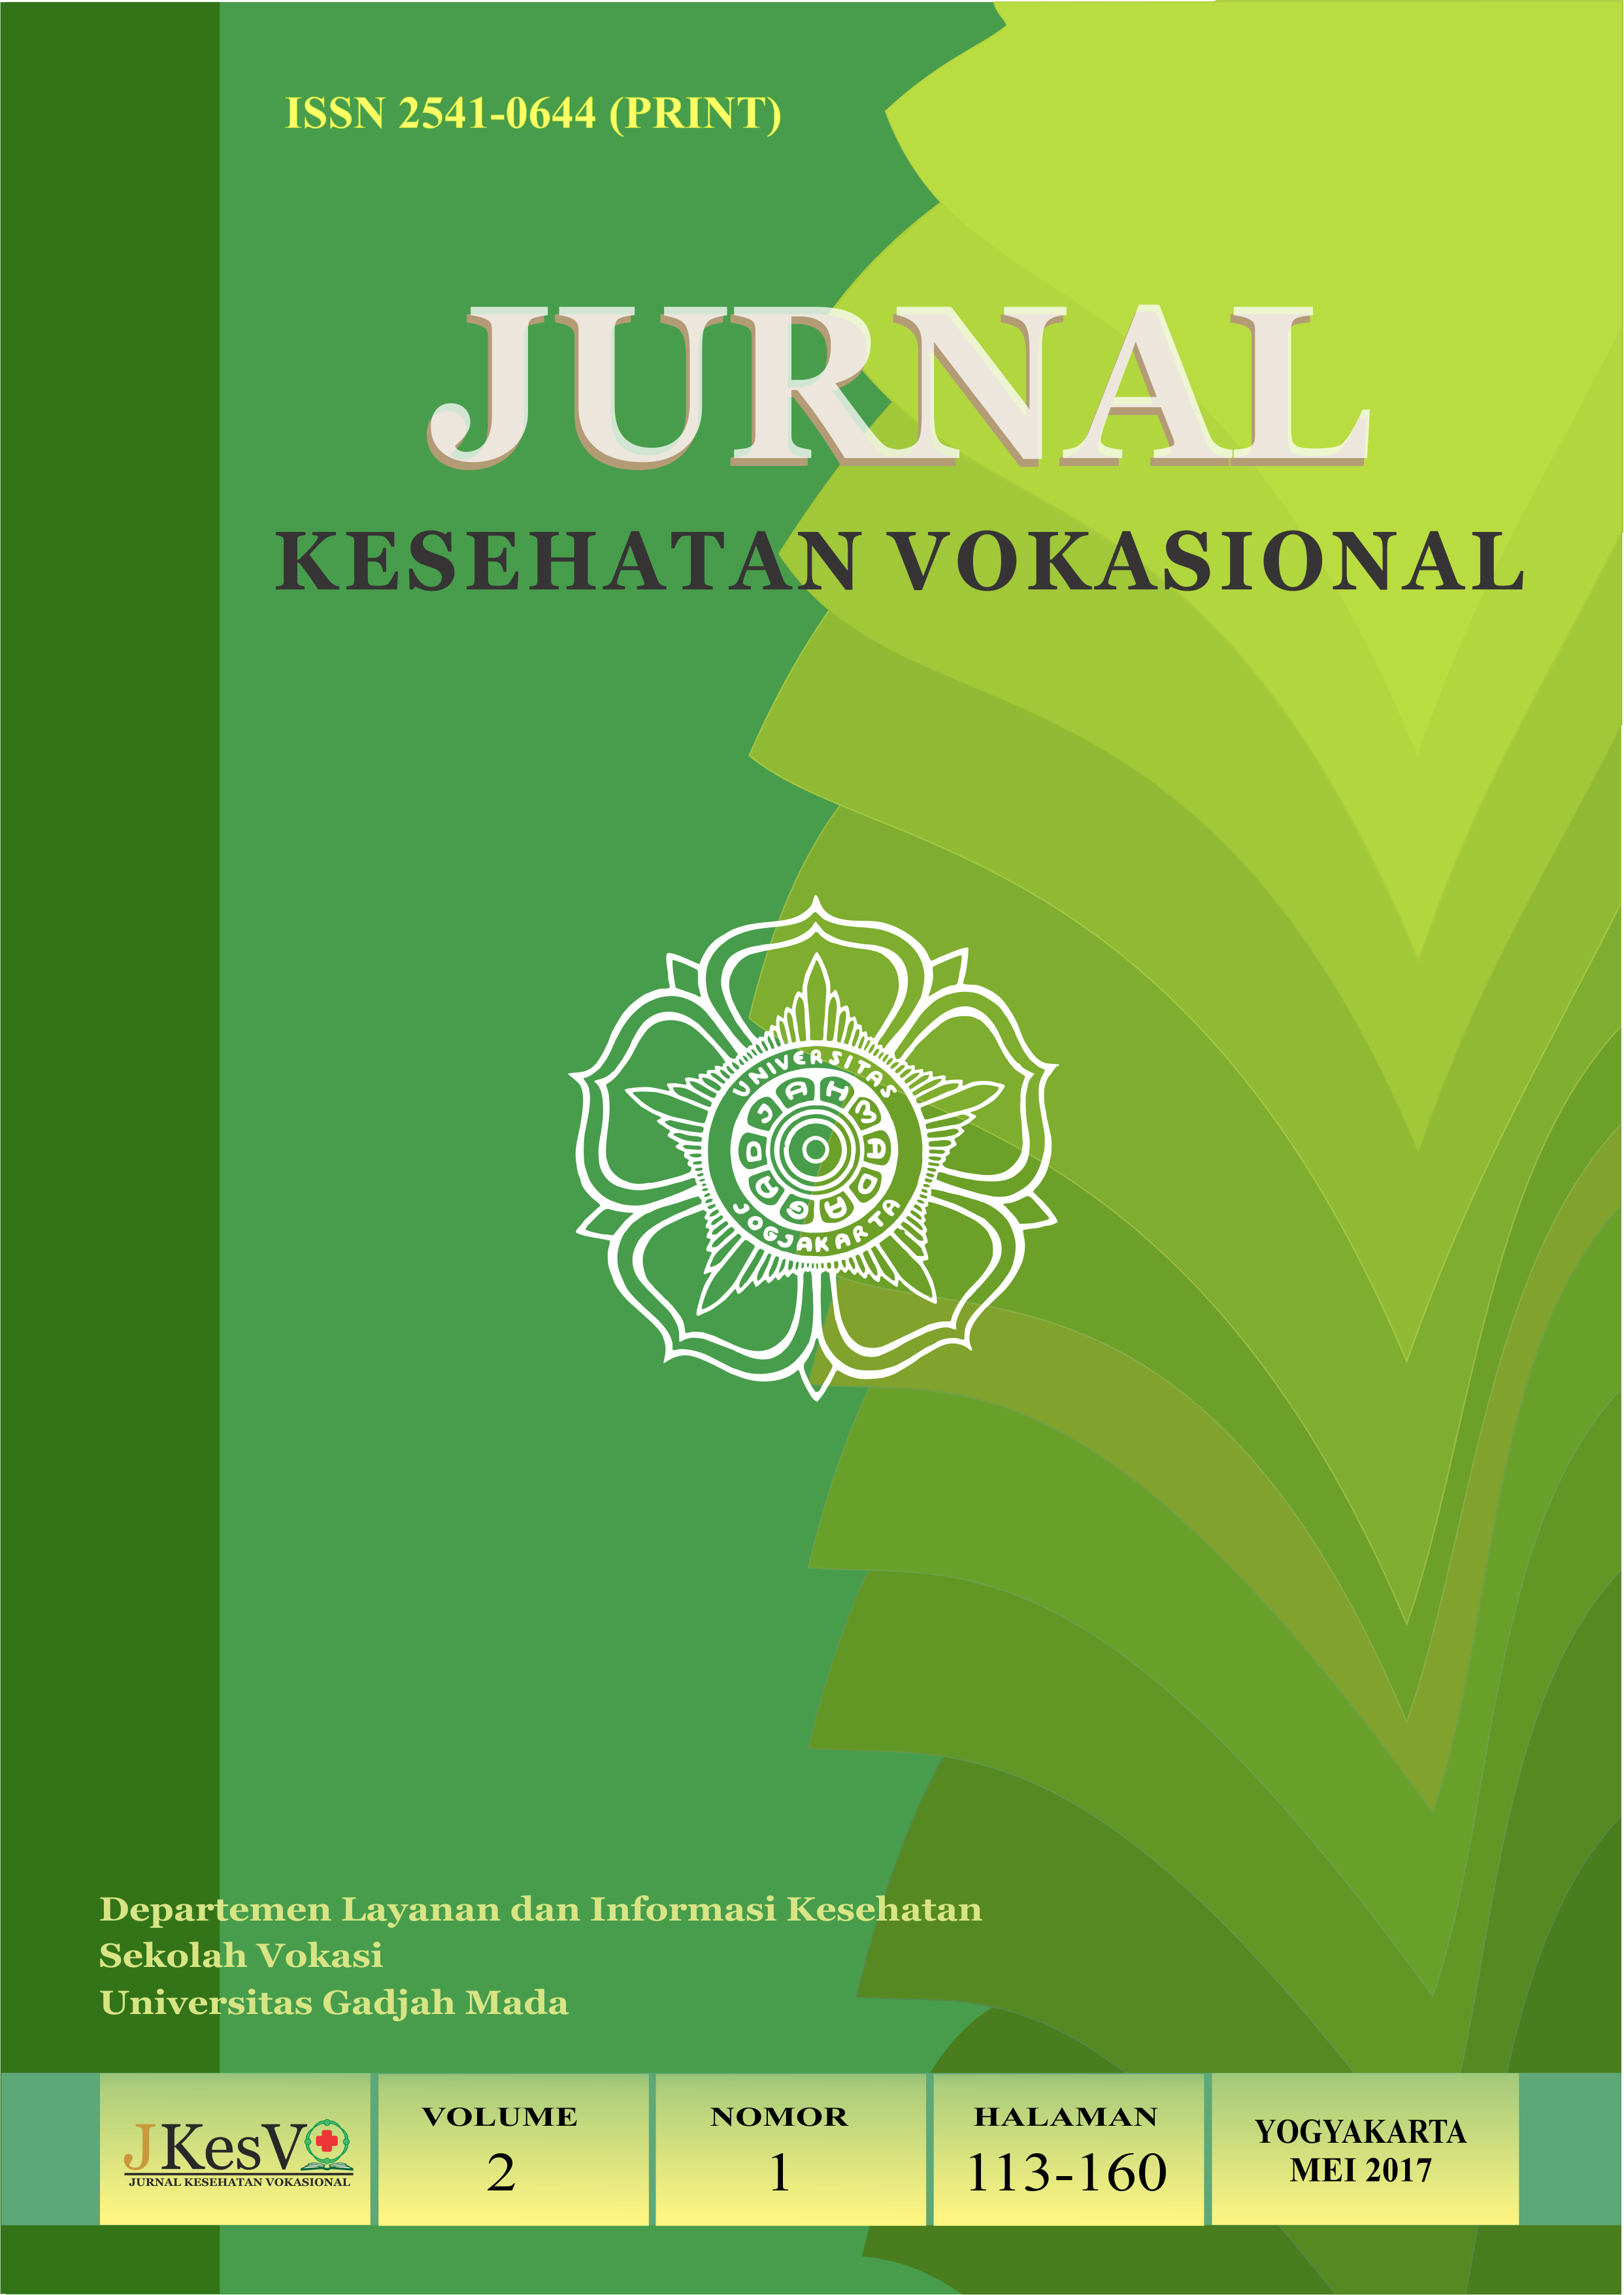 Cover Volume 2 No. 1